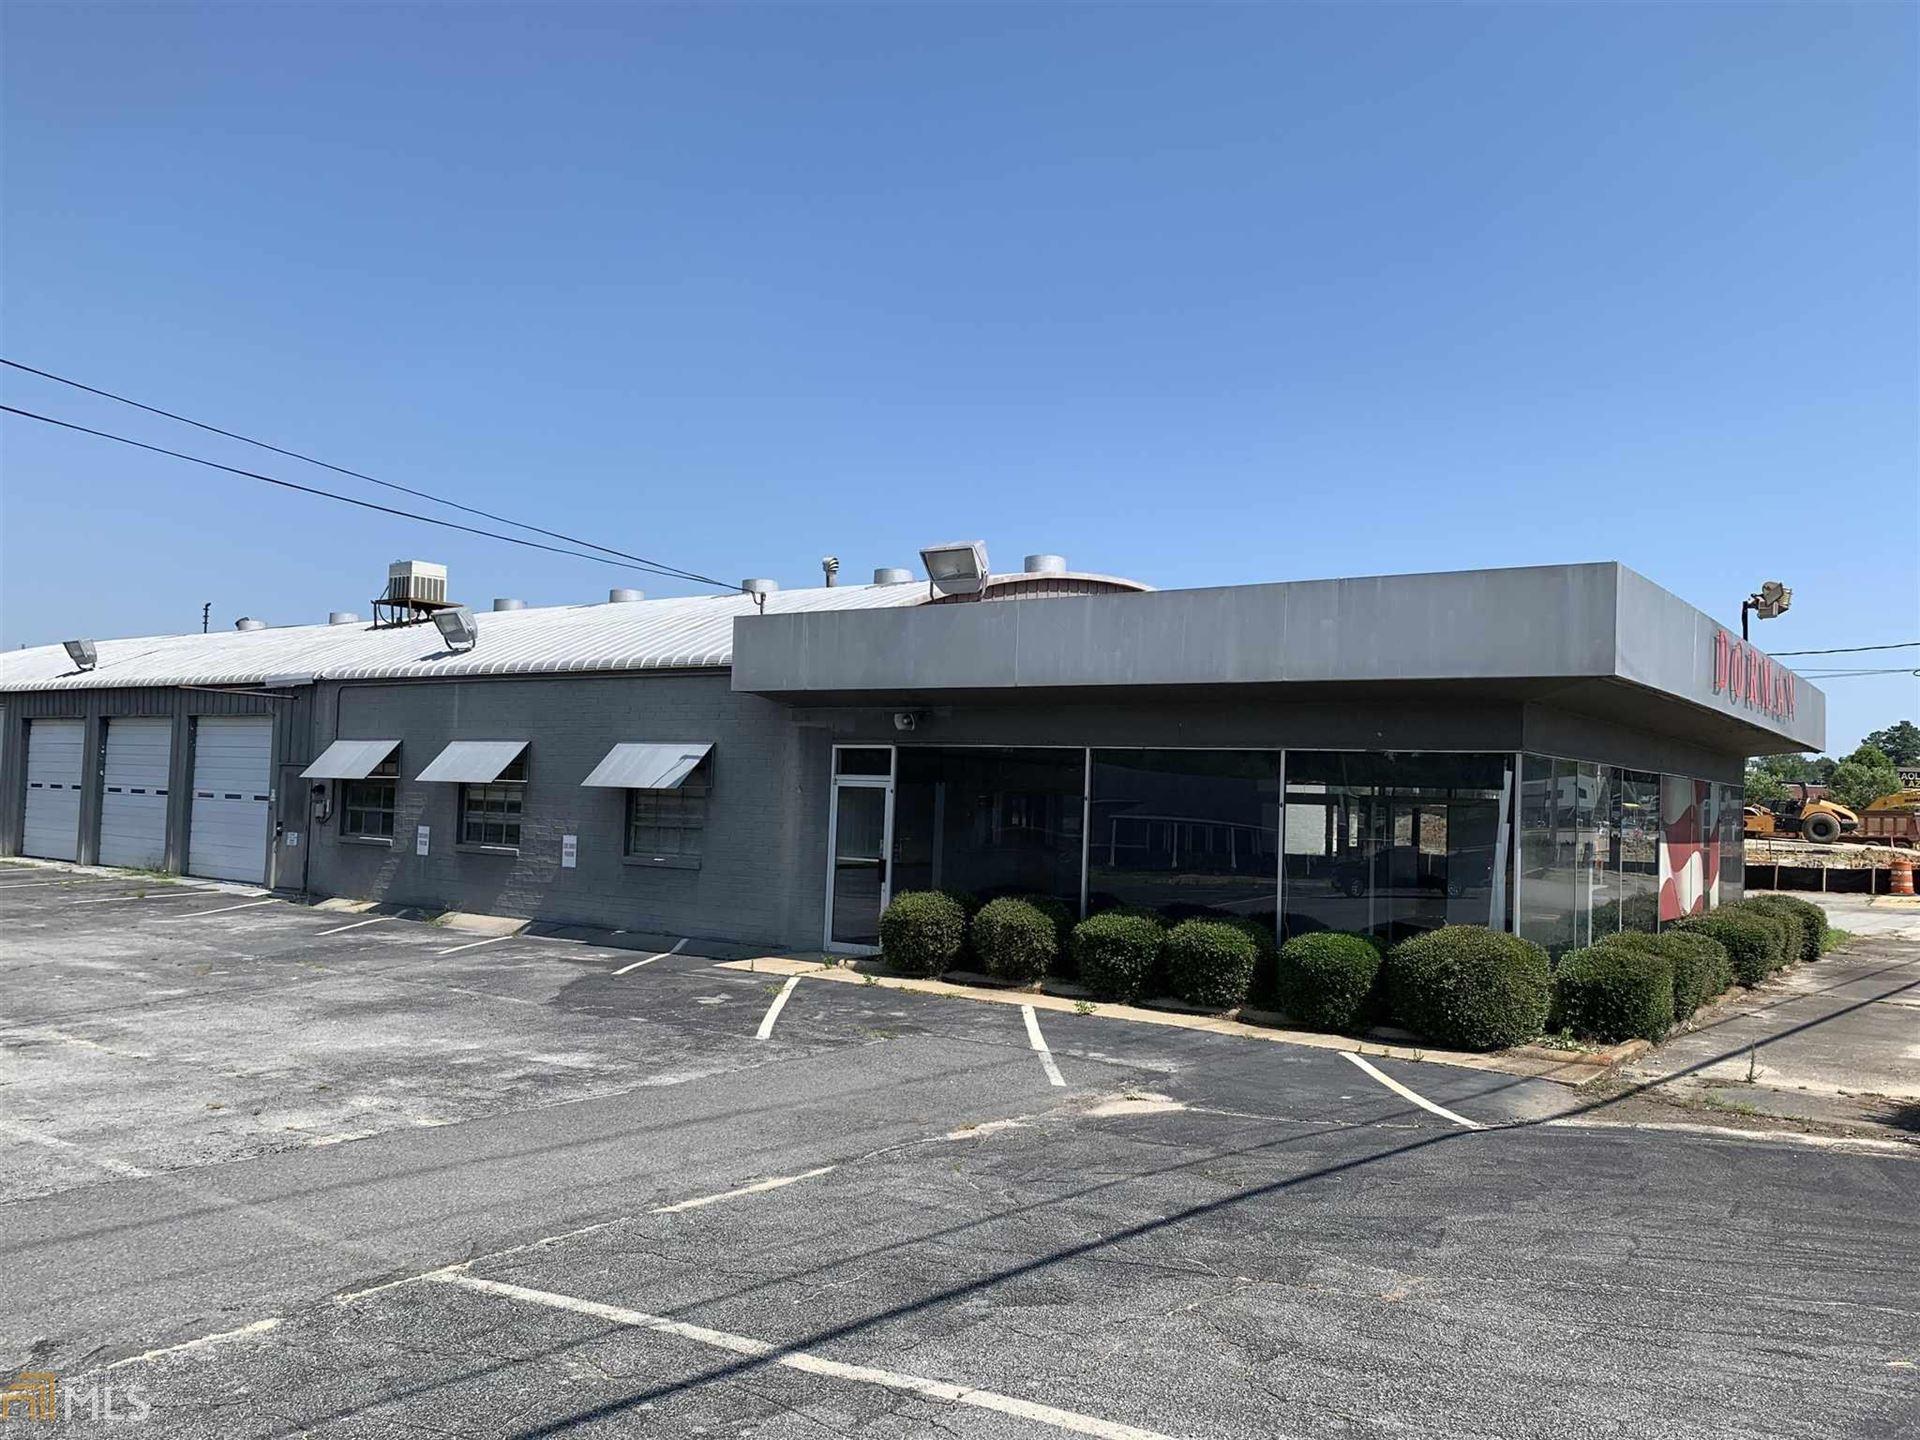 Photo of 724 S Harris Street, Sandersville, GA 31082 (MLS # 8999741)